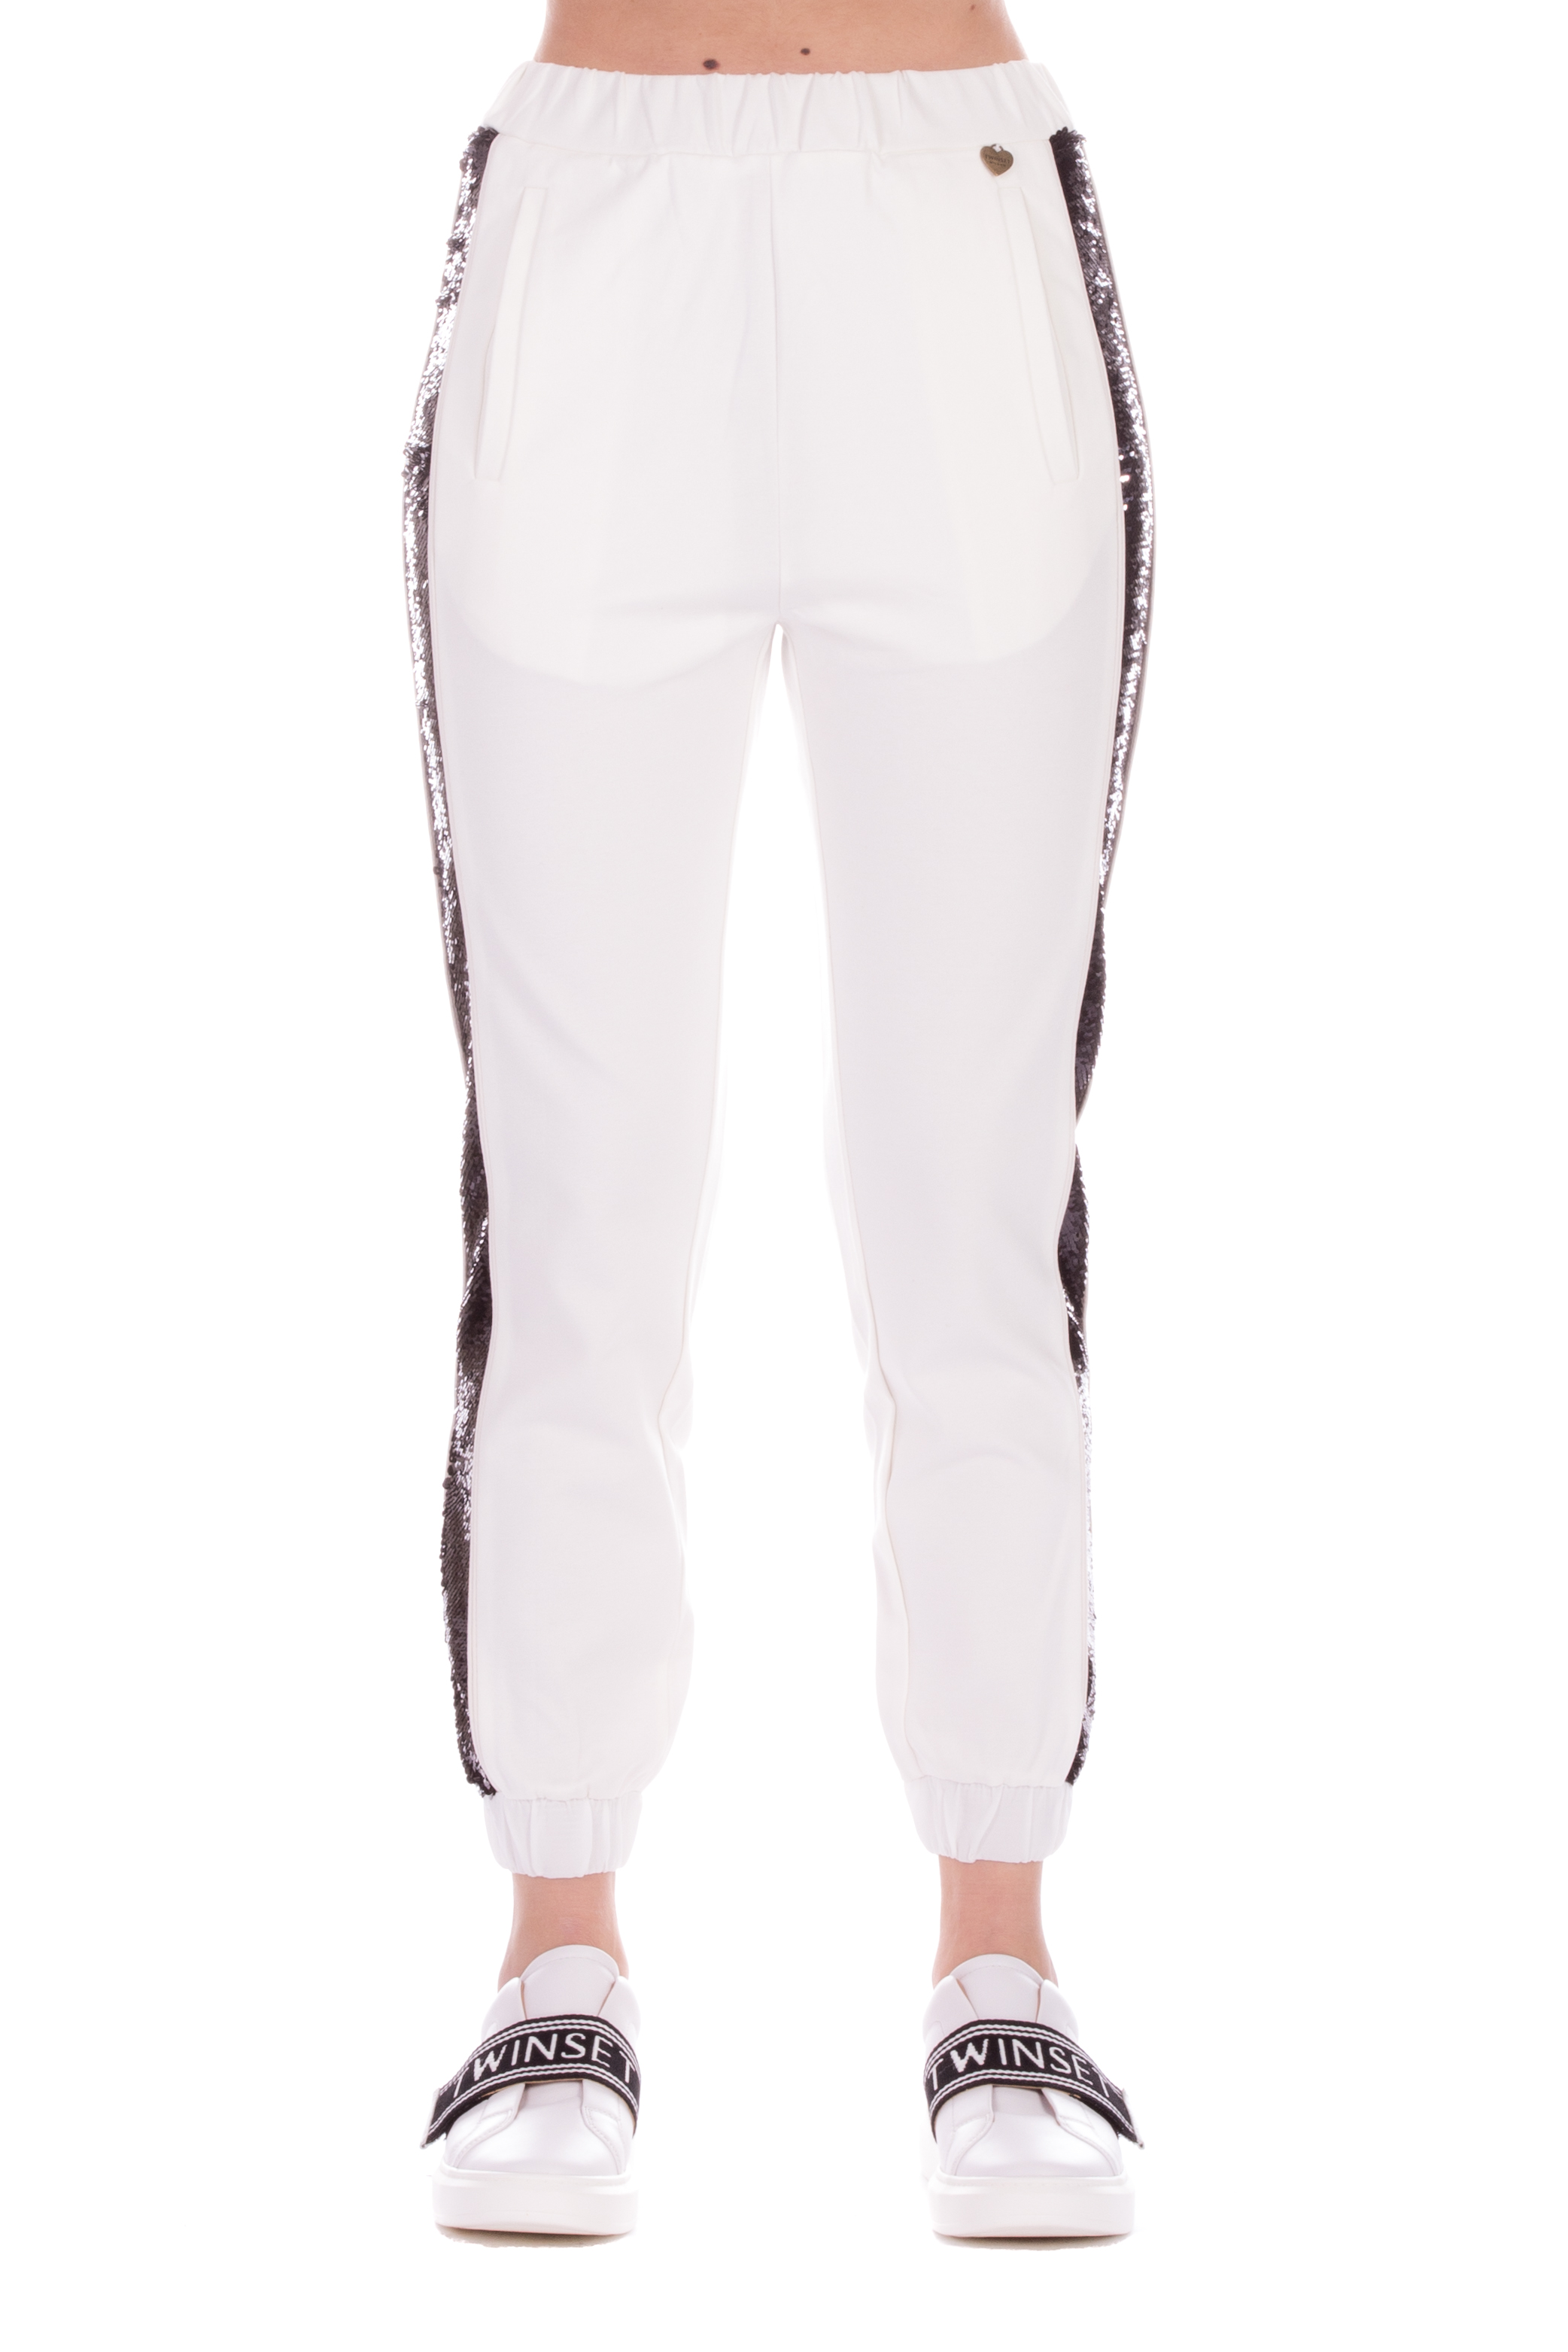 Twinset Pantaloni Jogging da Donna Nero,201TP2292